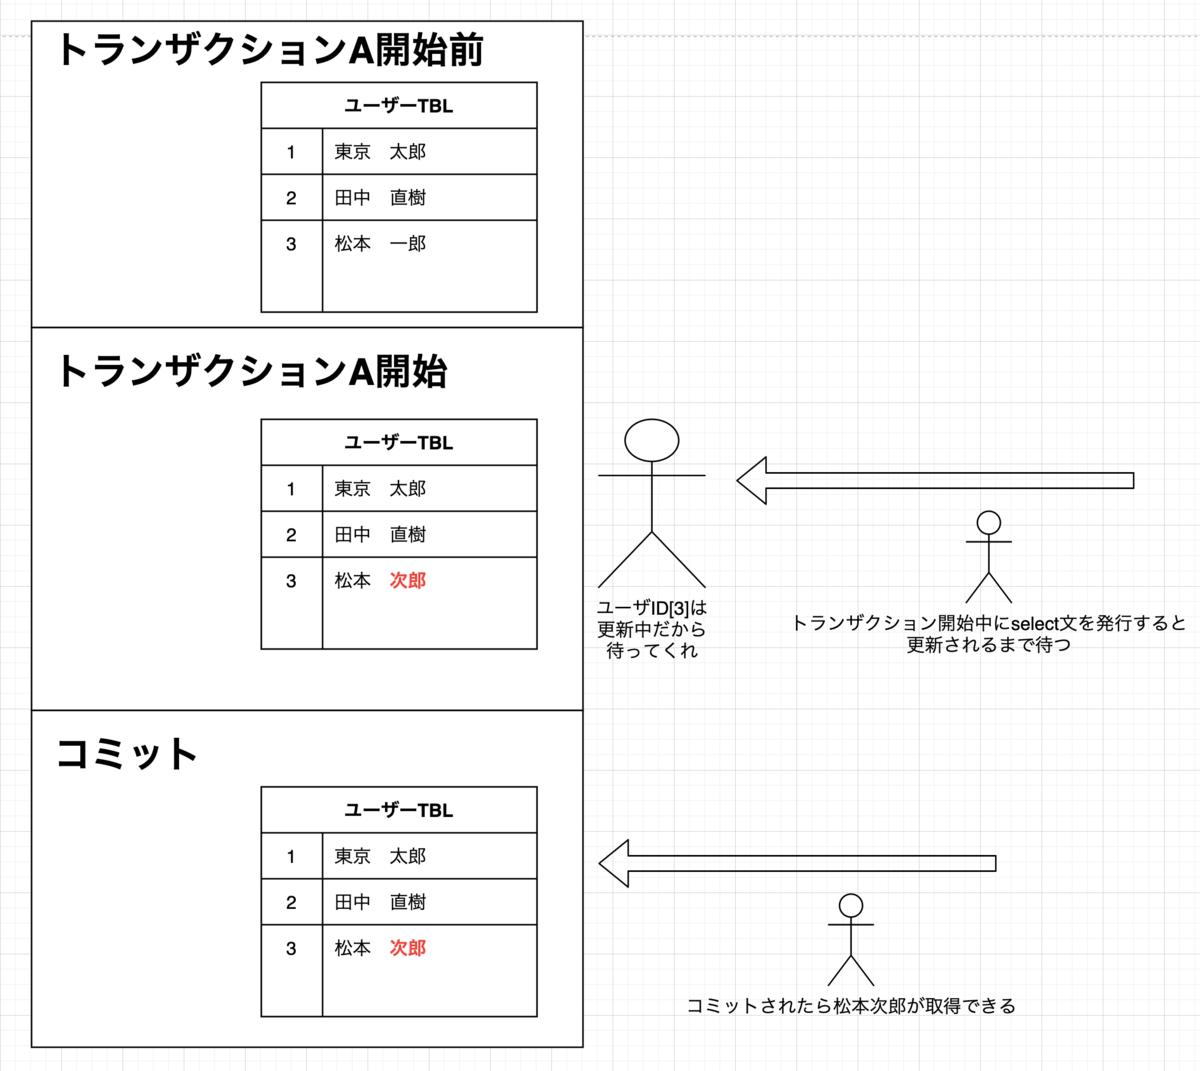 f:id:excite-naka-sho:20210513222410p:plain